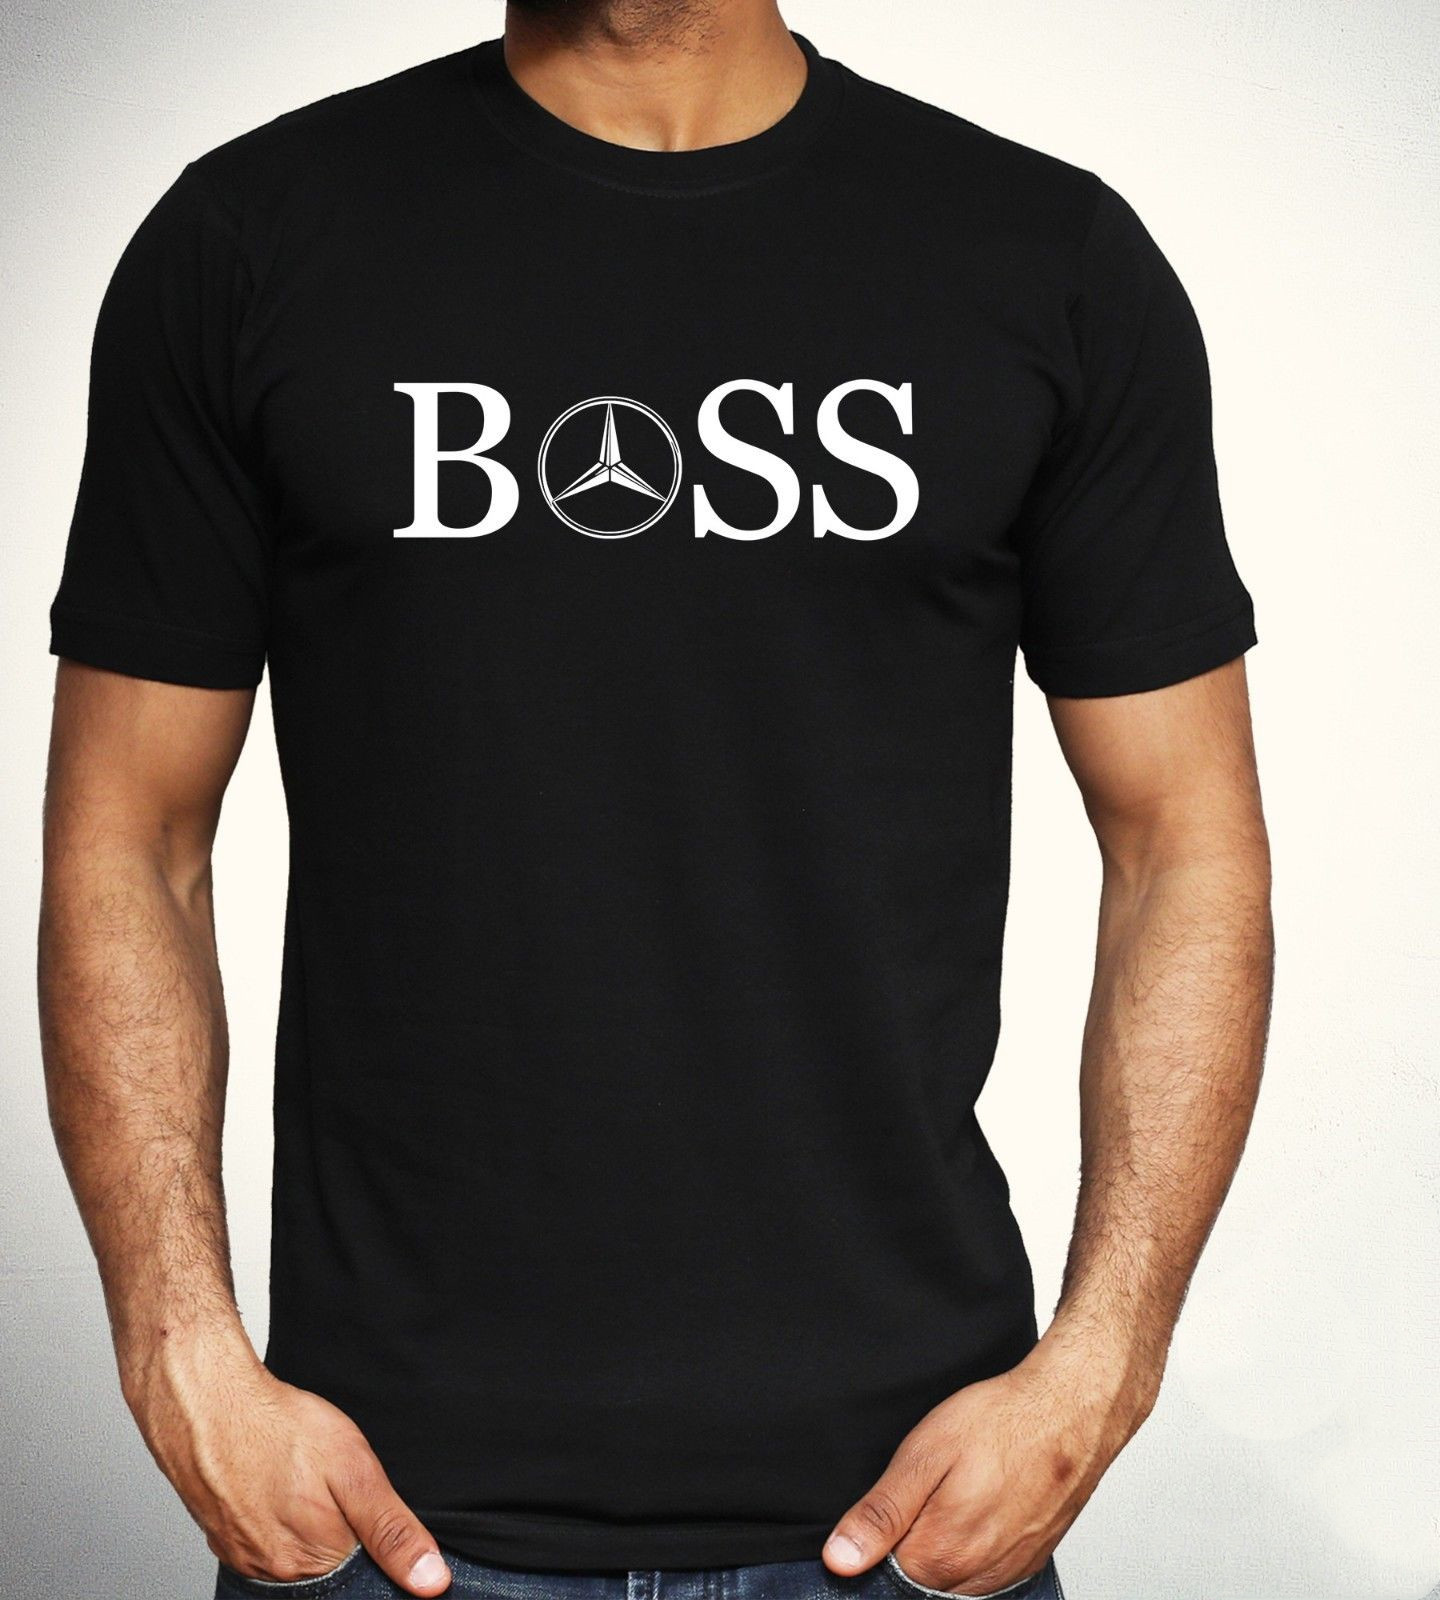 Formula 1 T-shirt F1 Racing T Shirt Car F1 Fashion Novelty Tee Mens New Unisex Size S-3XL